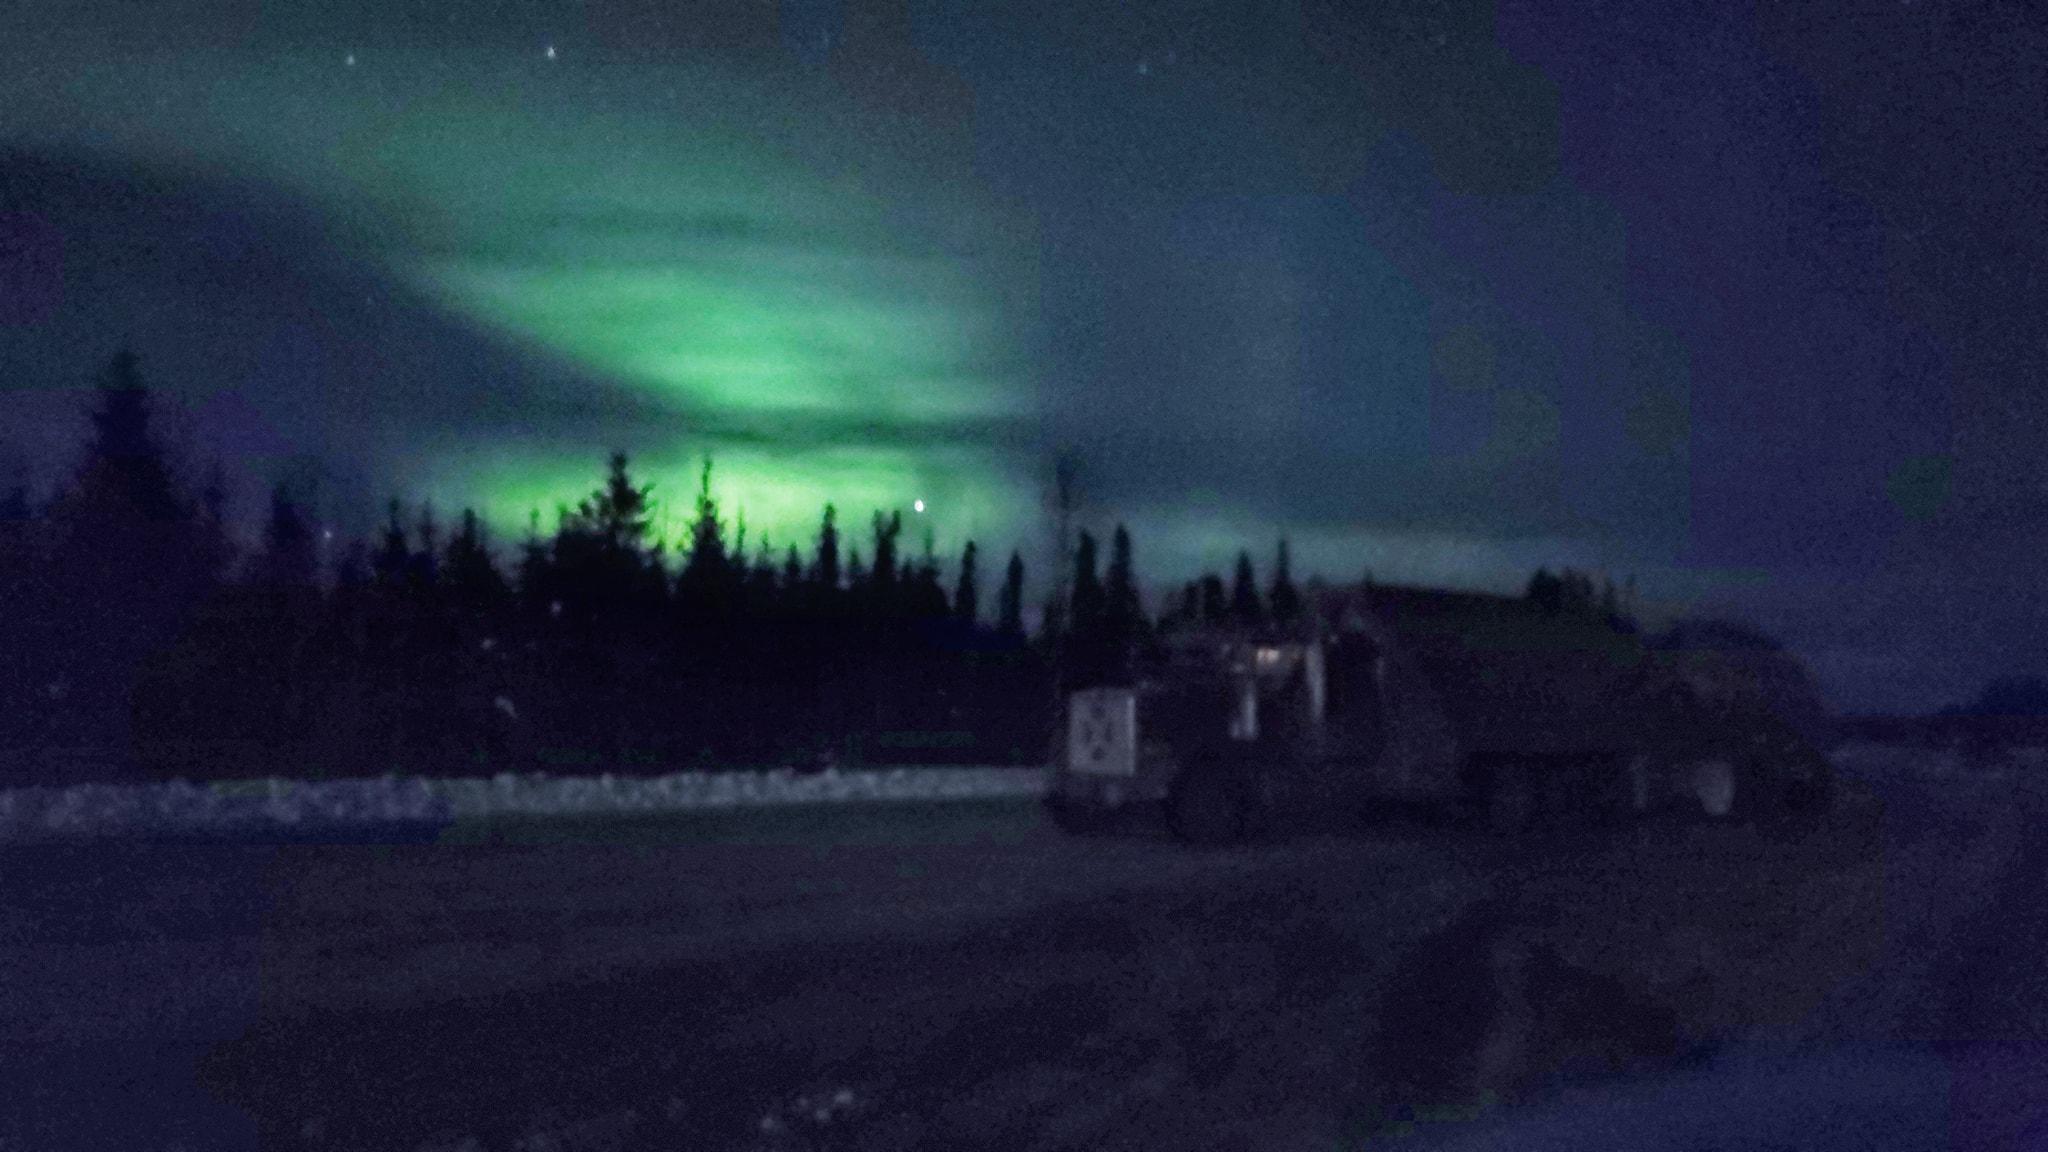 The--Alaska-Highway-19-1-2021--(1)